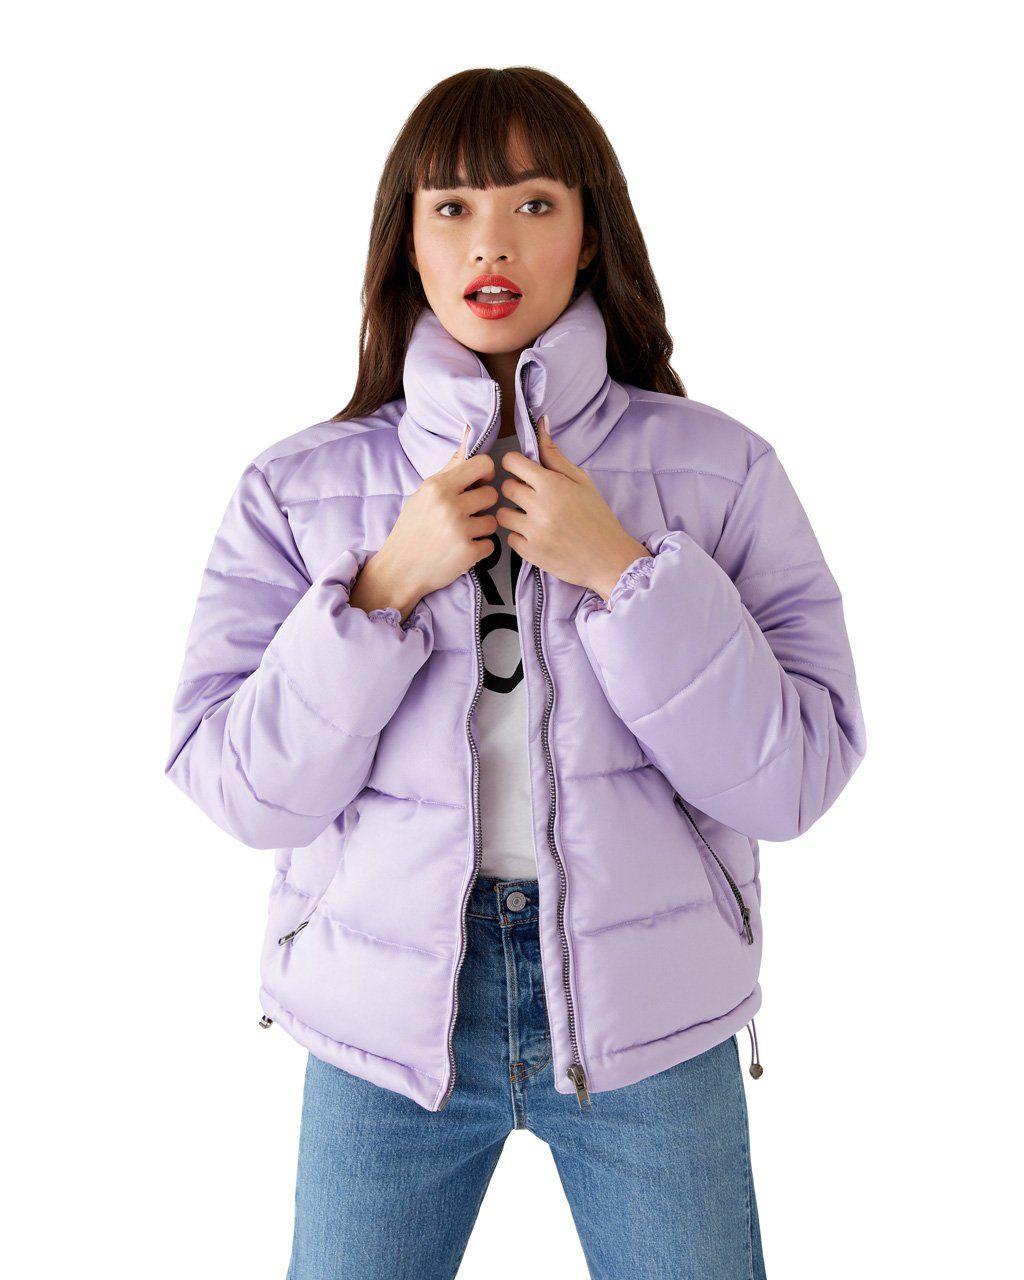 Lilac Puffer Jacket By Glamorous Jacket Ban Do Puffer Jacket Women Puffer Jacket Outfit Jackets [ 1280 x 1024 Pixel ]